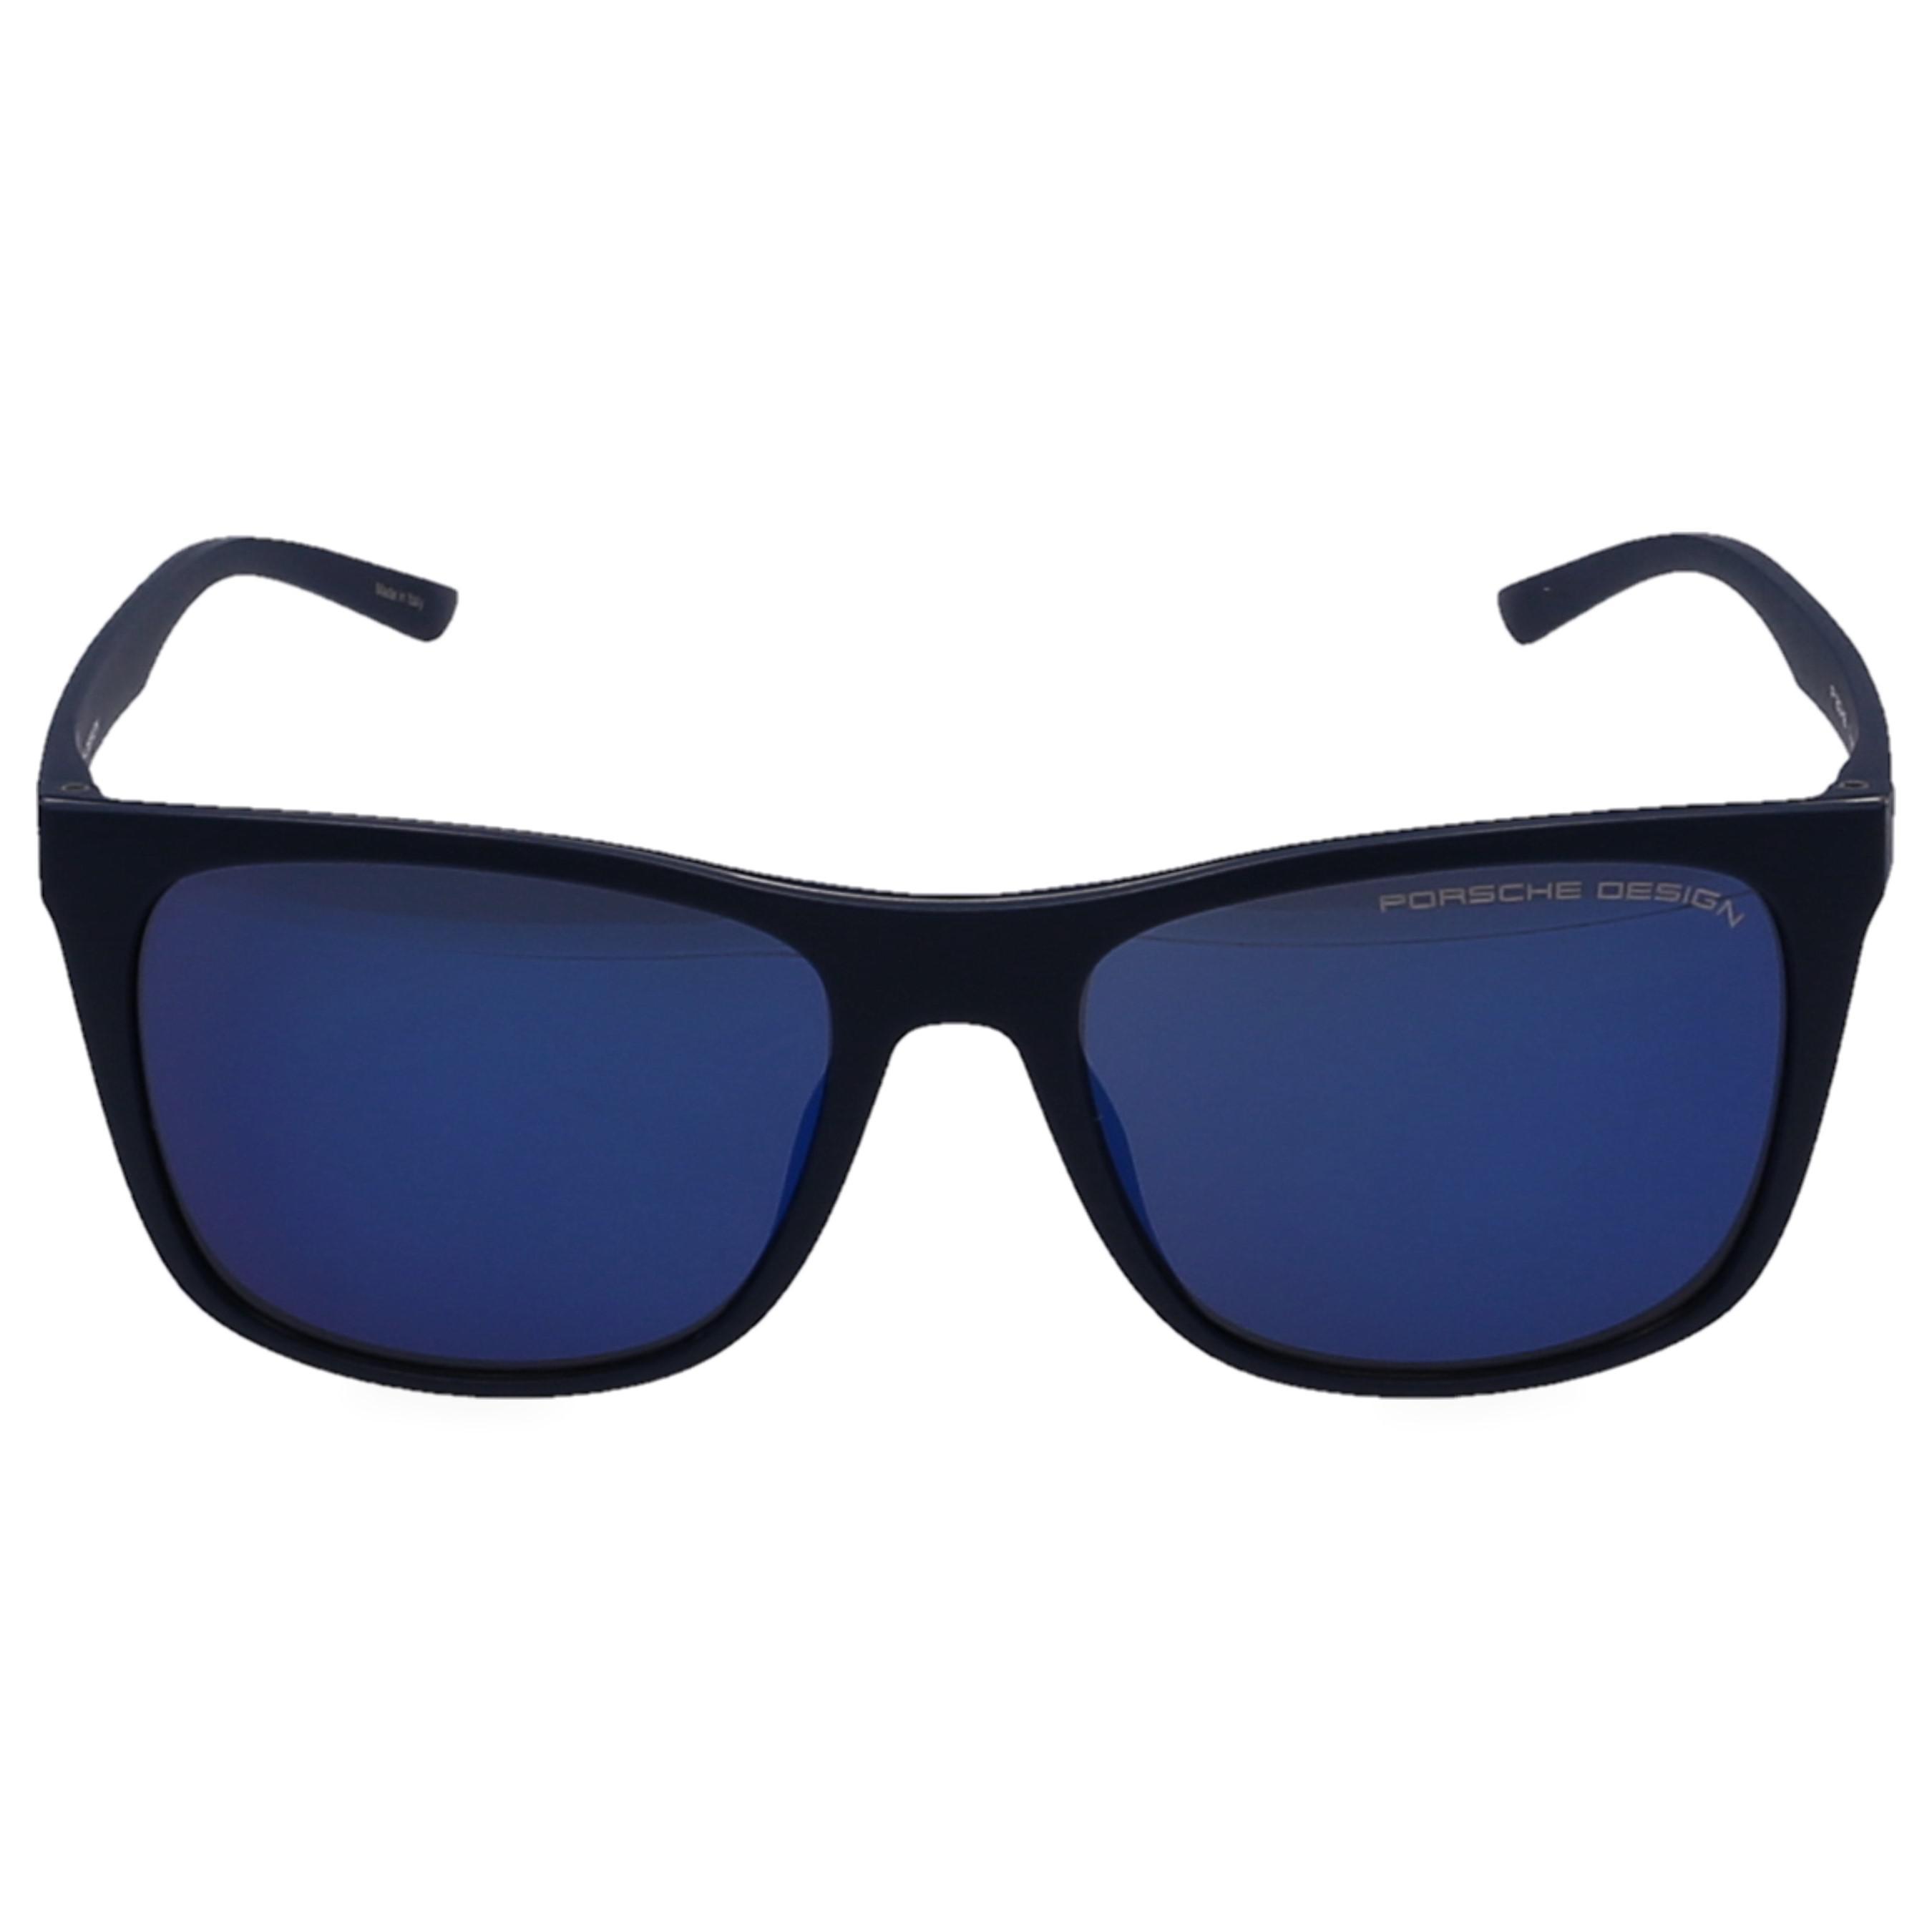 8625563f252 Lyst - Porsche Design Sunglasses Square 8648 Mirrored Acetate Blue ...